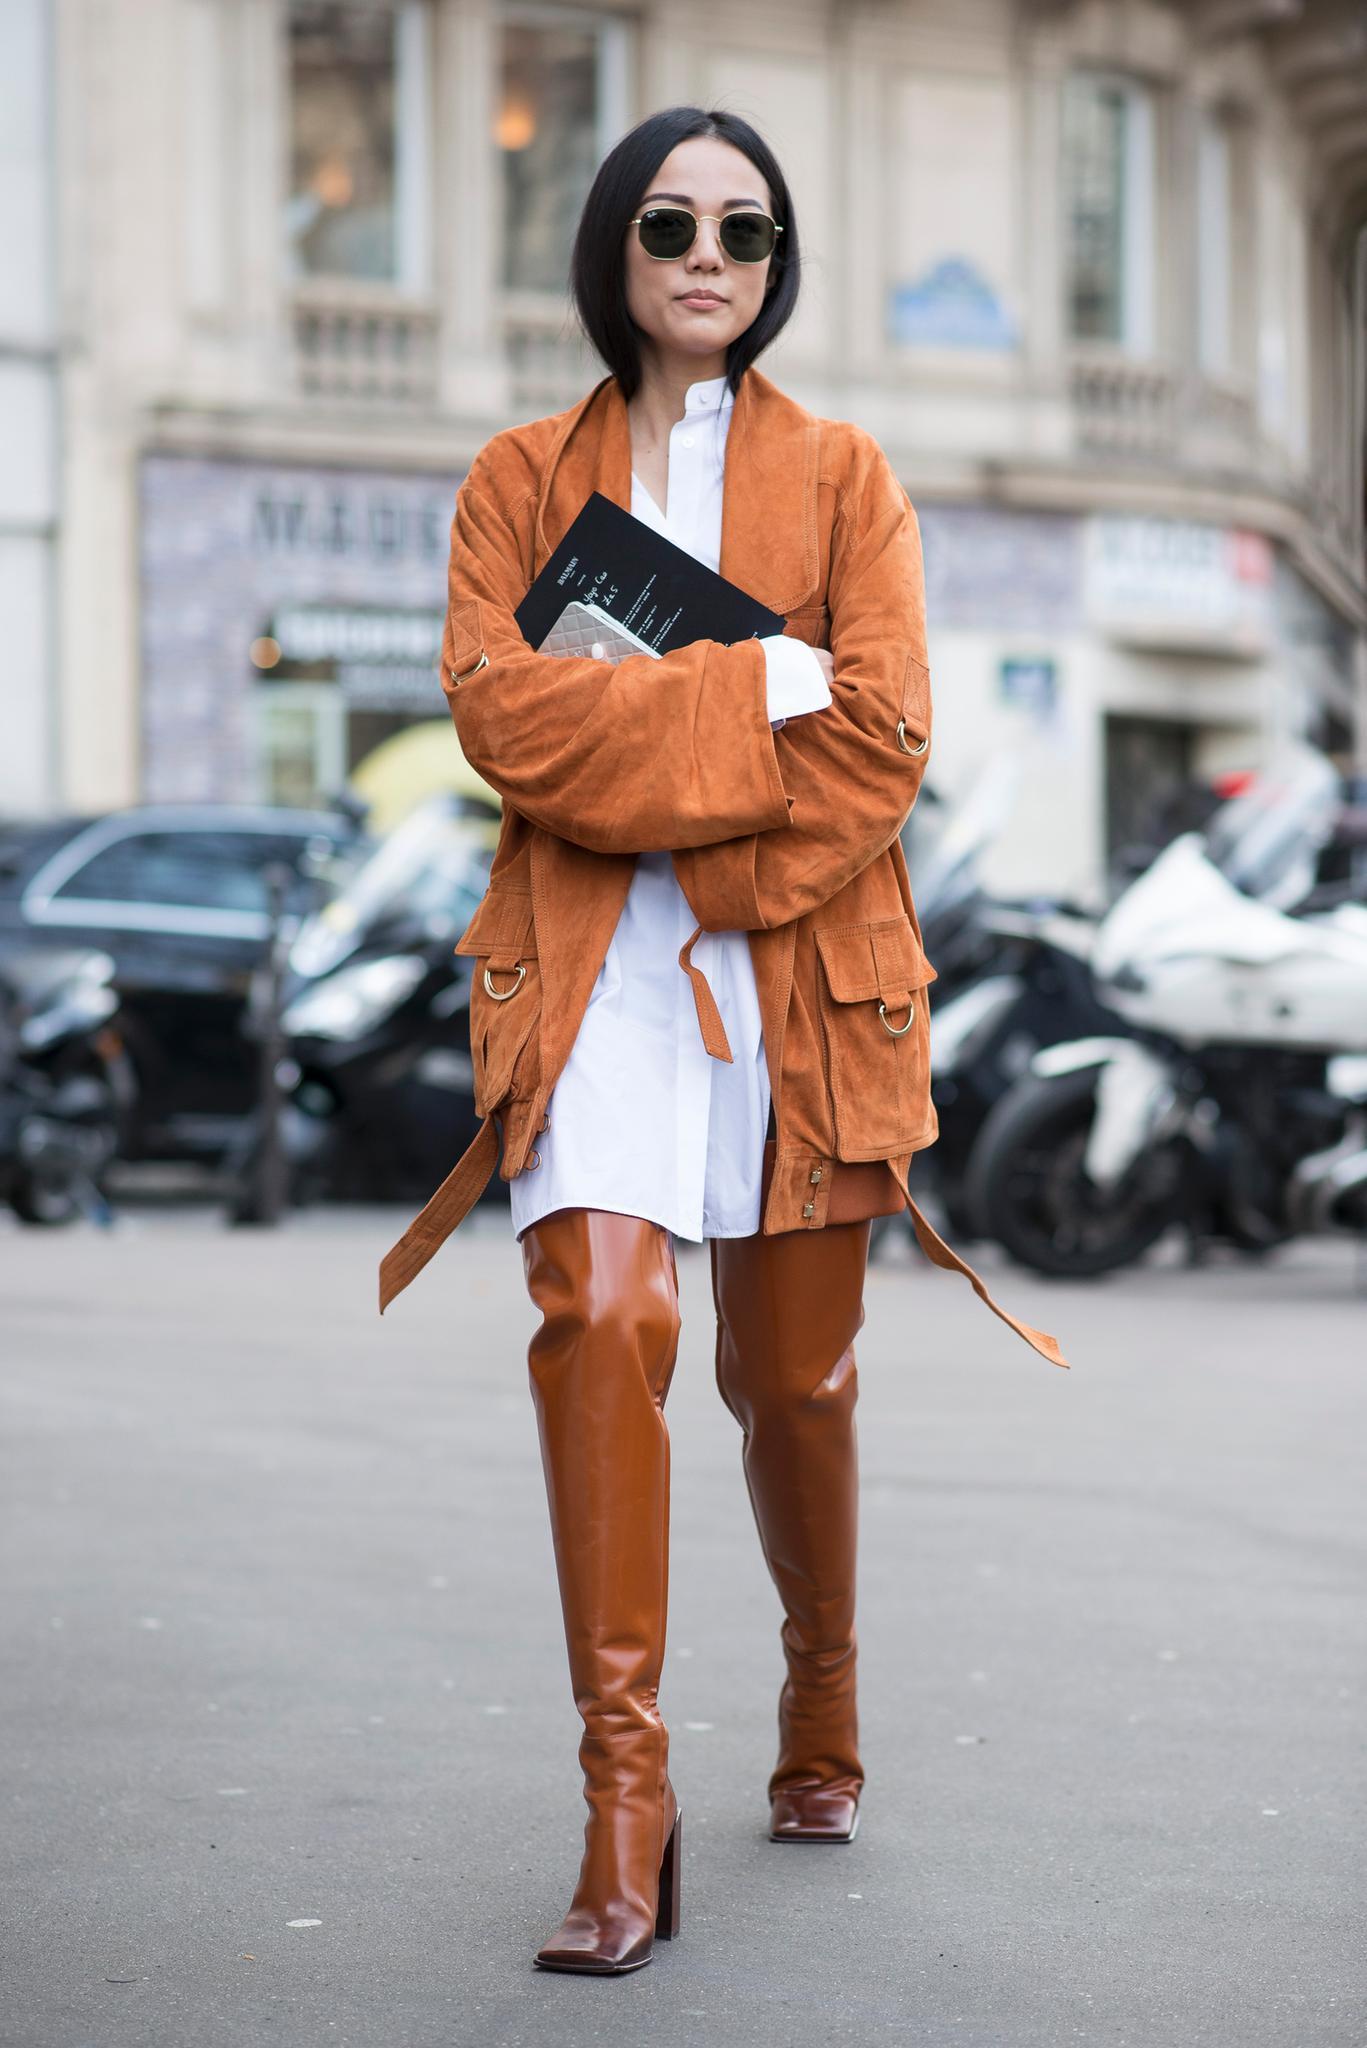 Bloggerin trägt braune Overknees